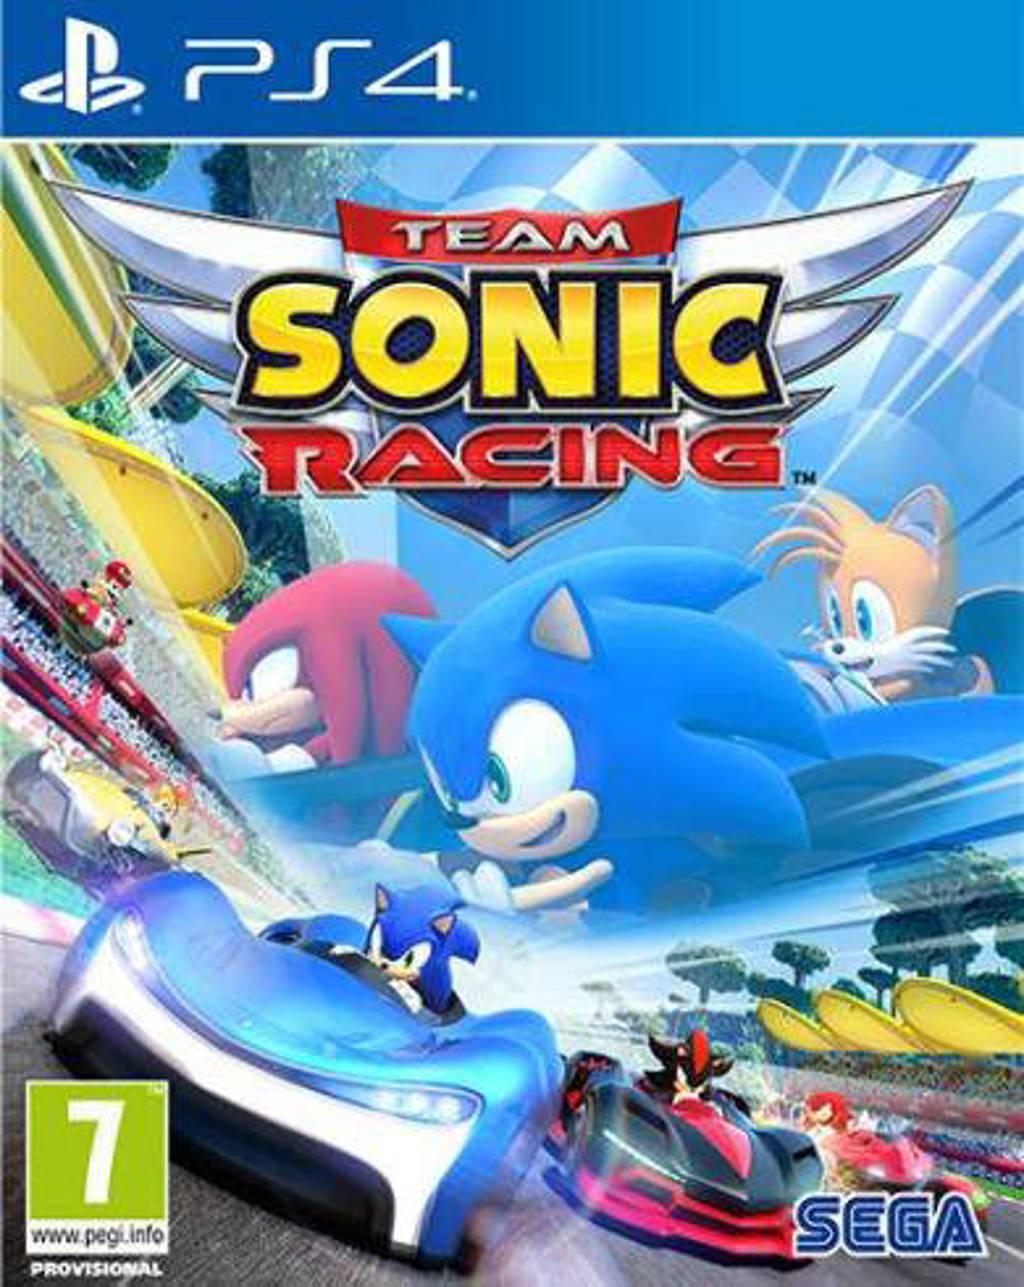 Team Sonic racing (PlayStation 4)